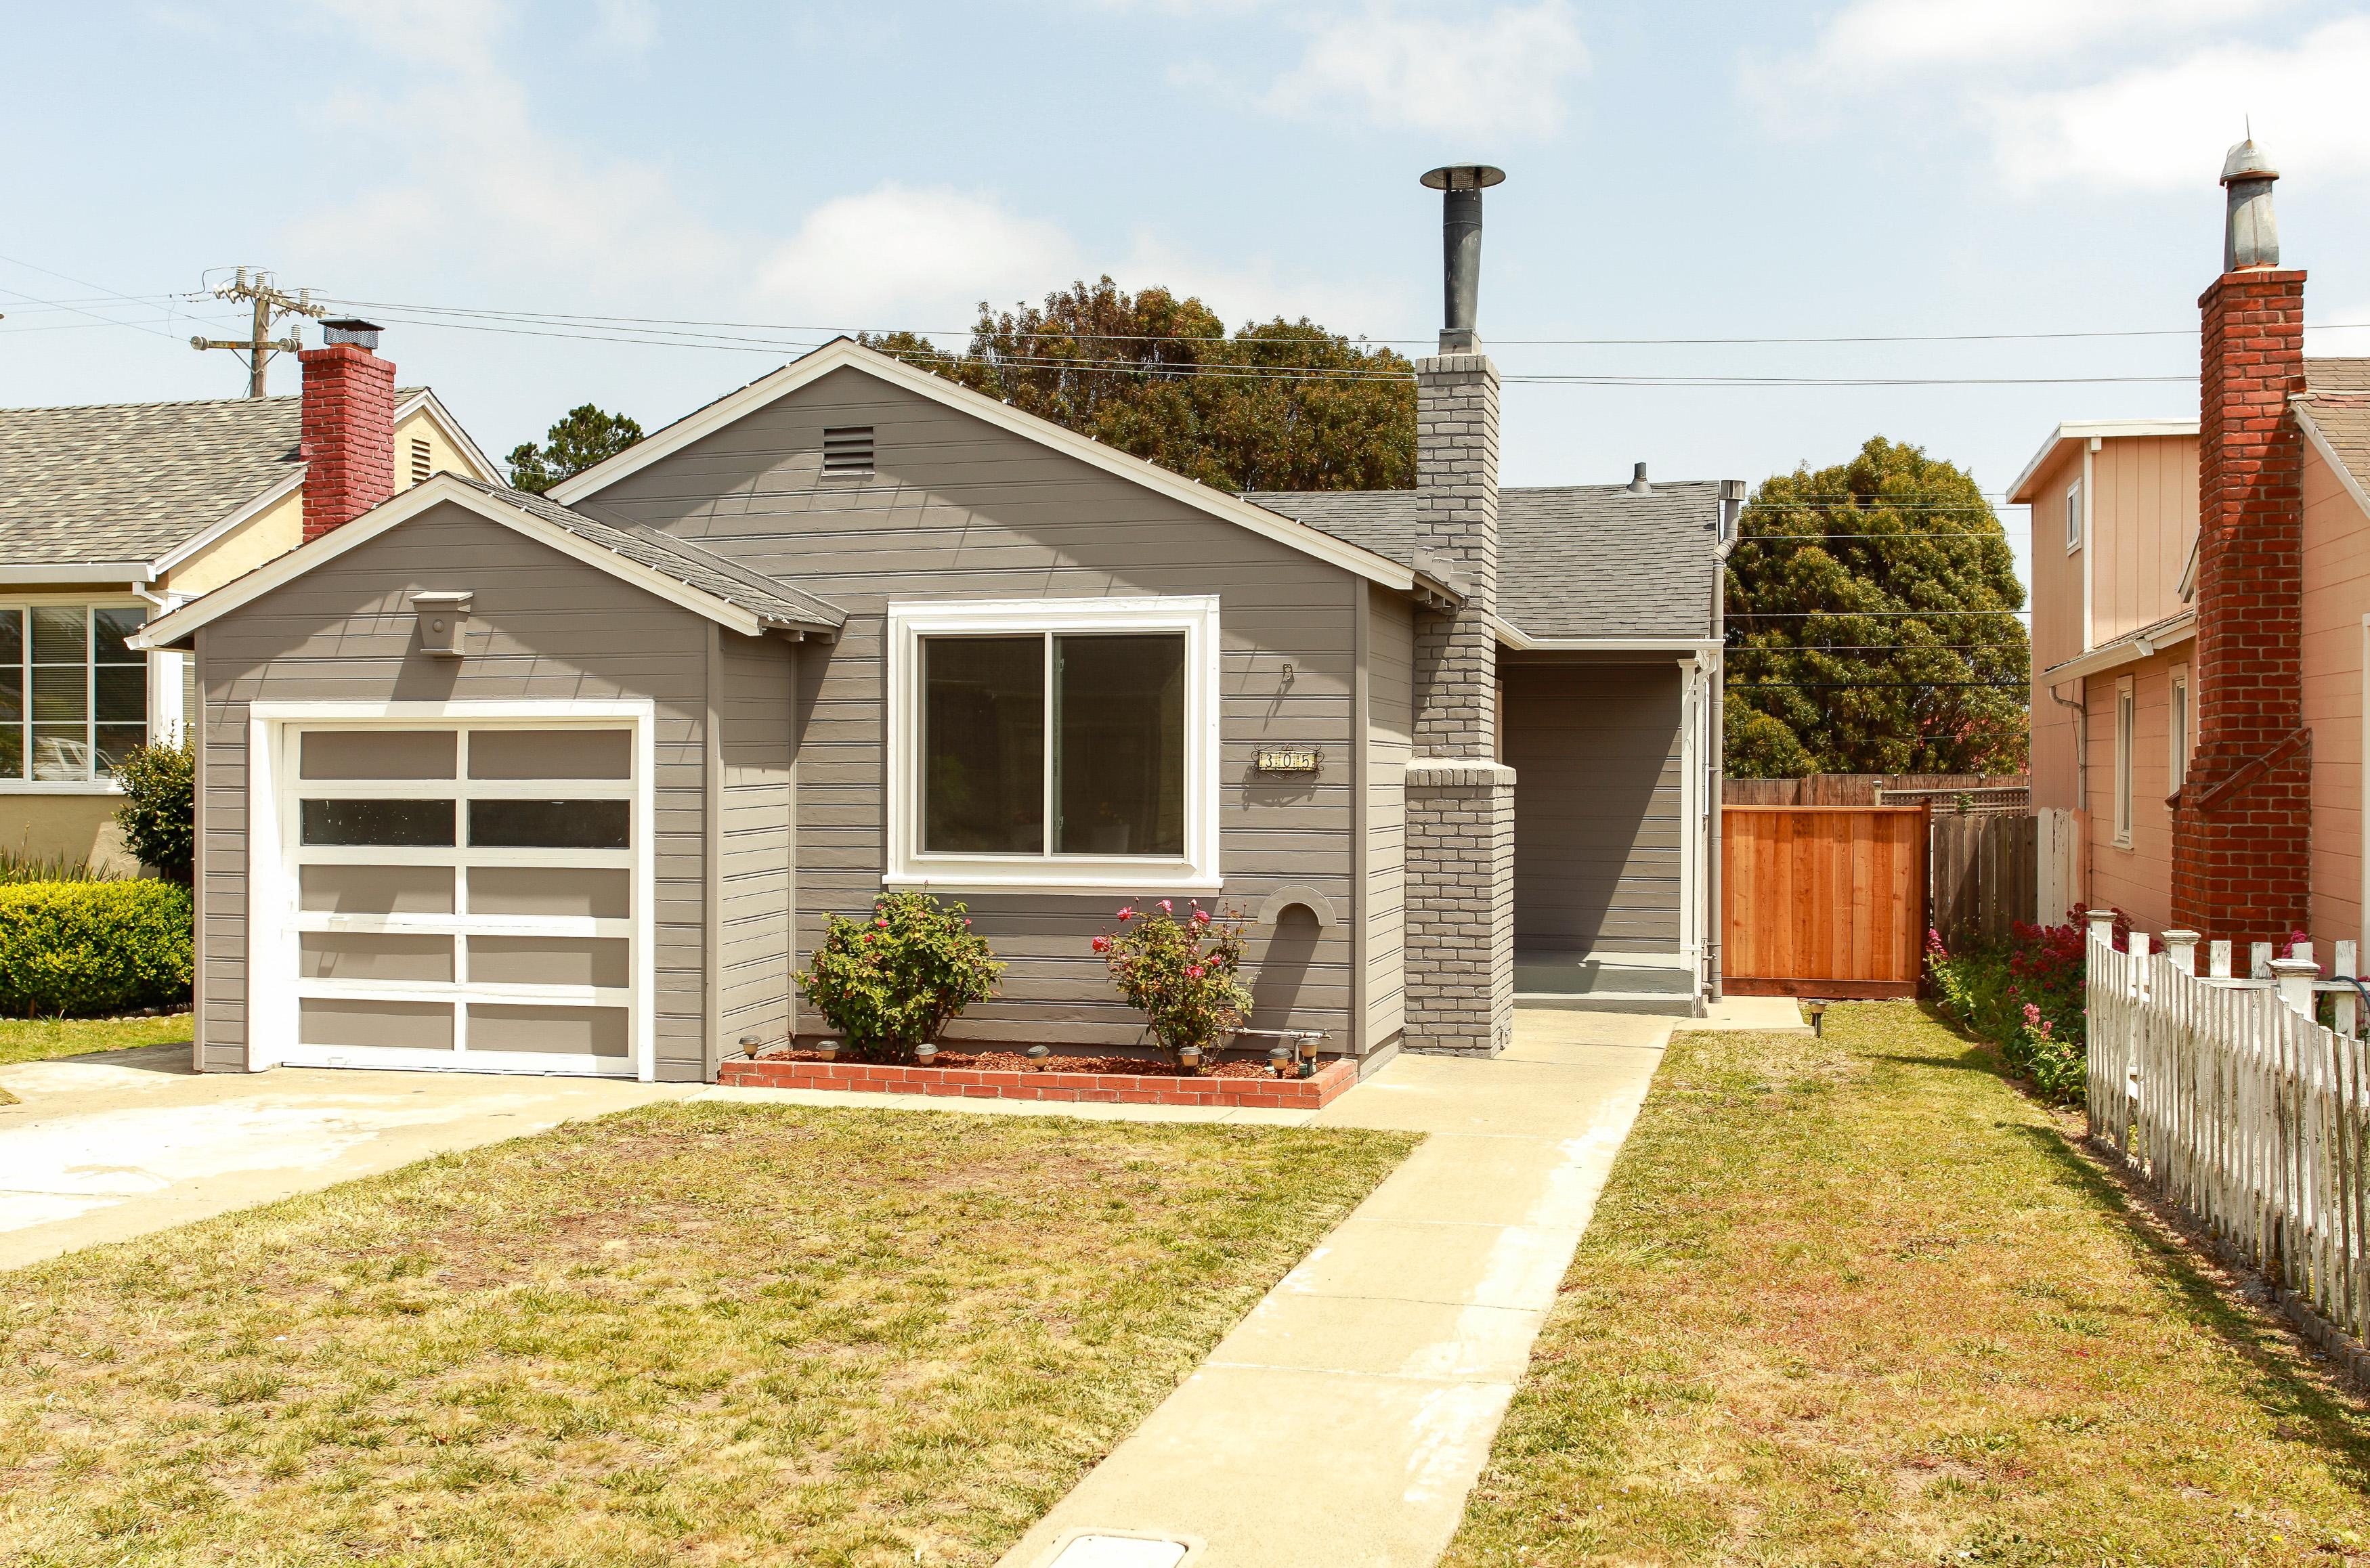 305 Fairway Dr, South San Francisco, CA 94080